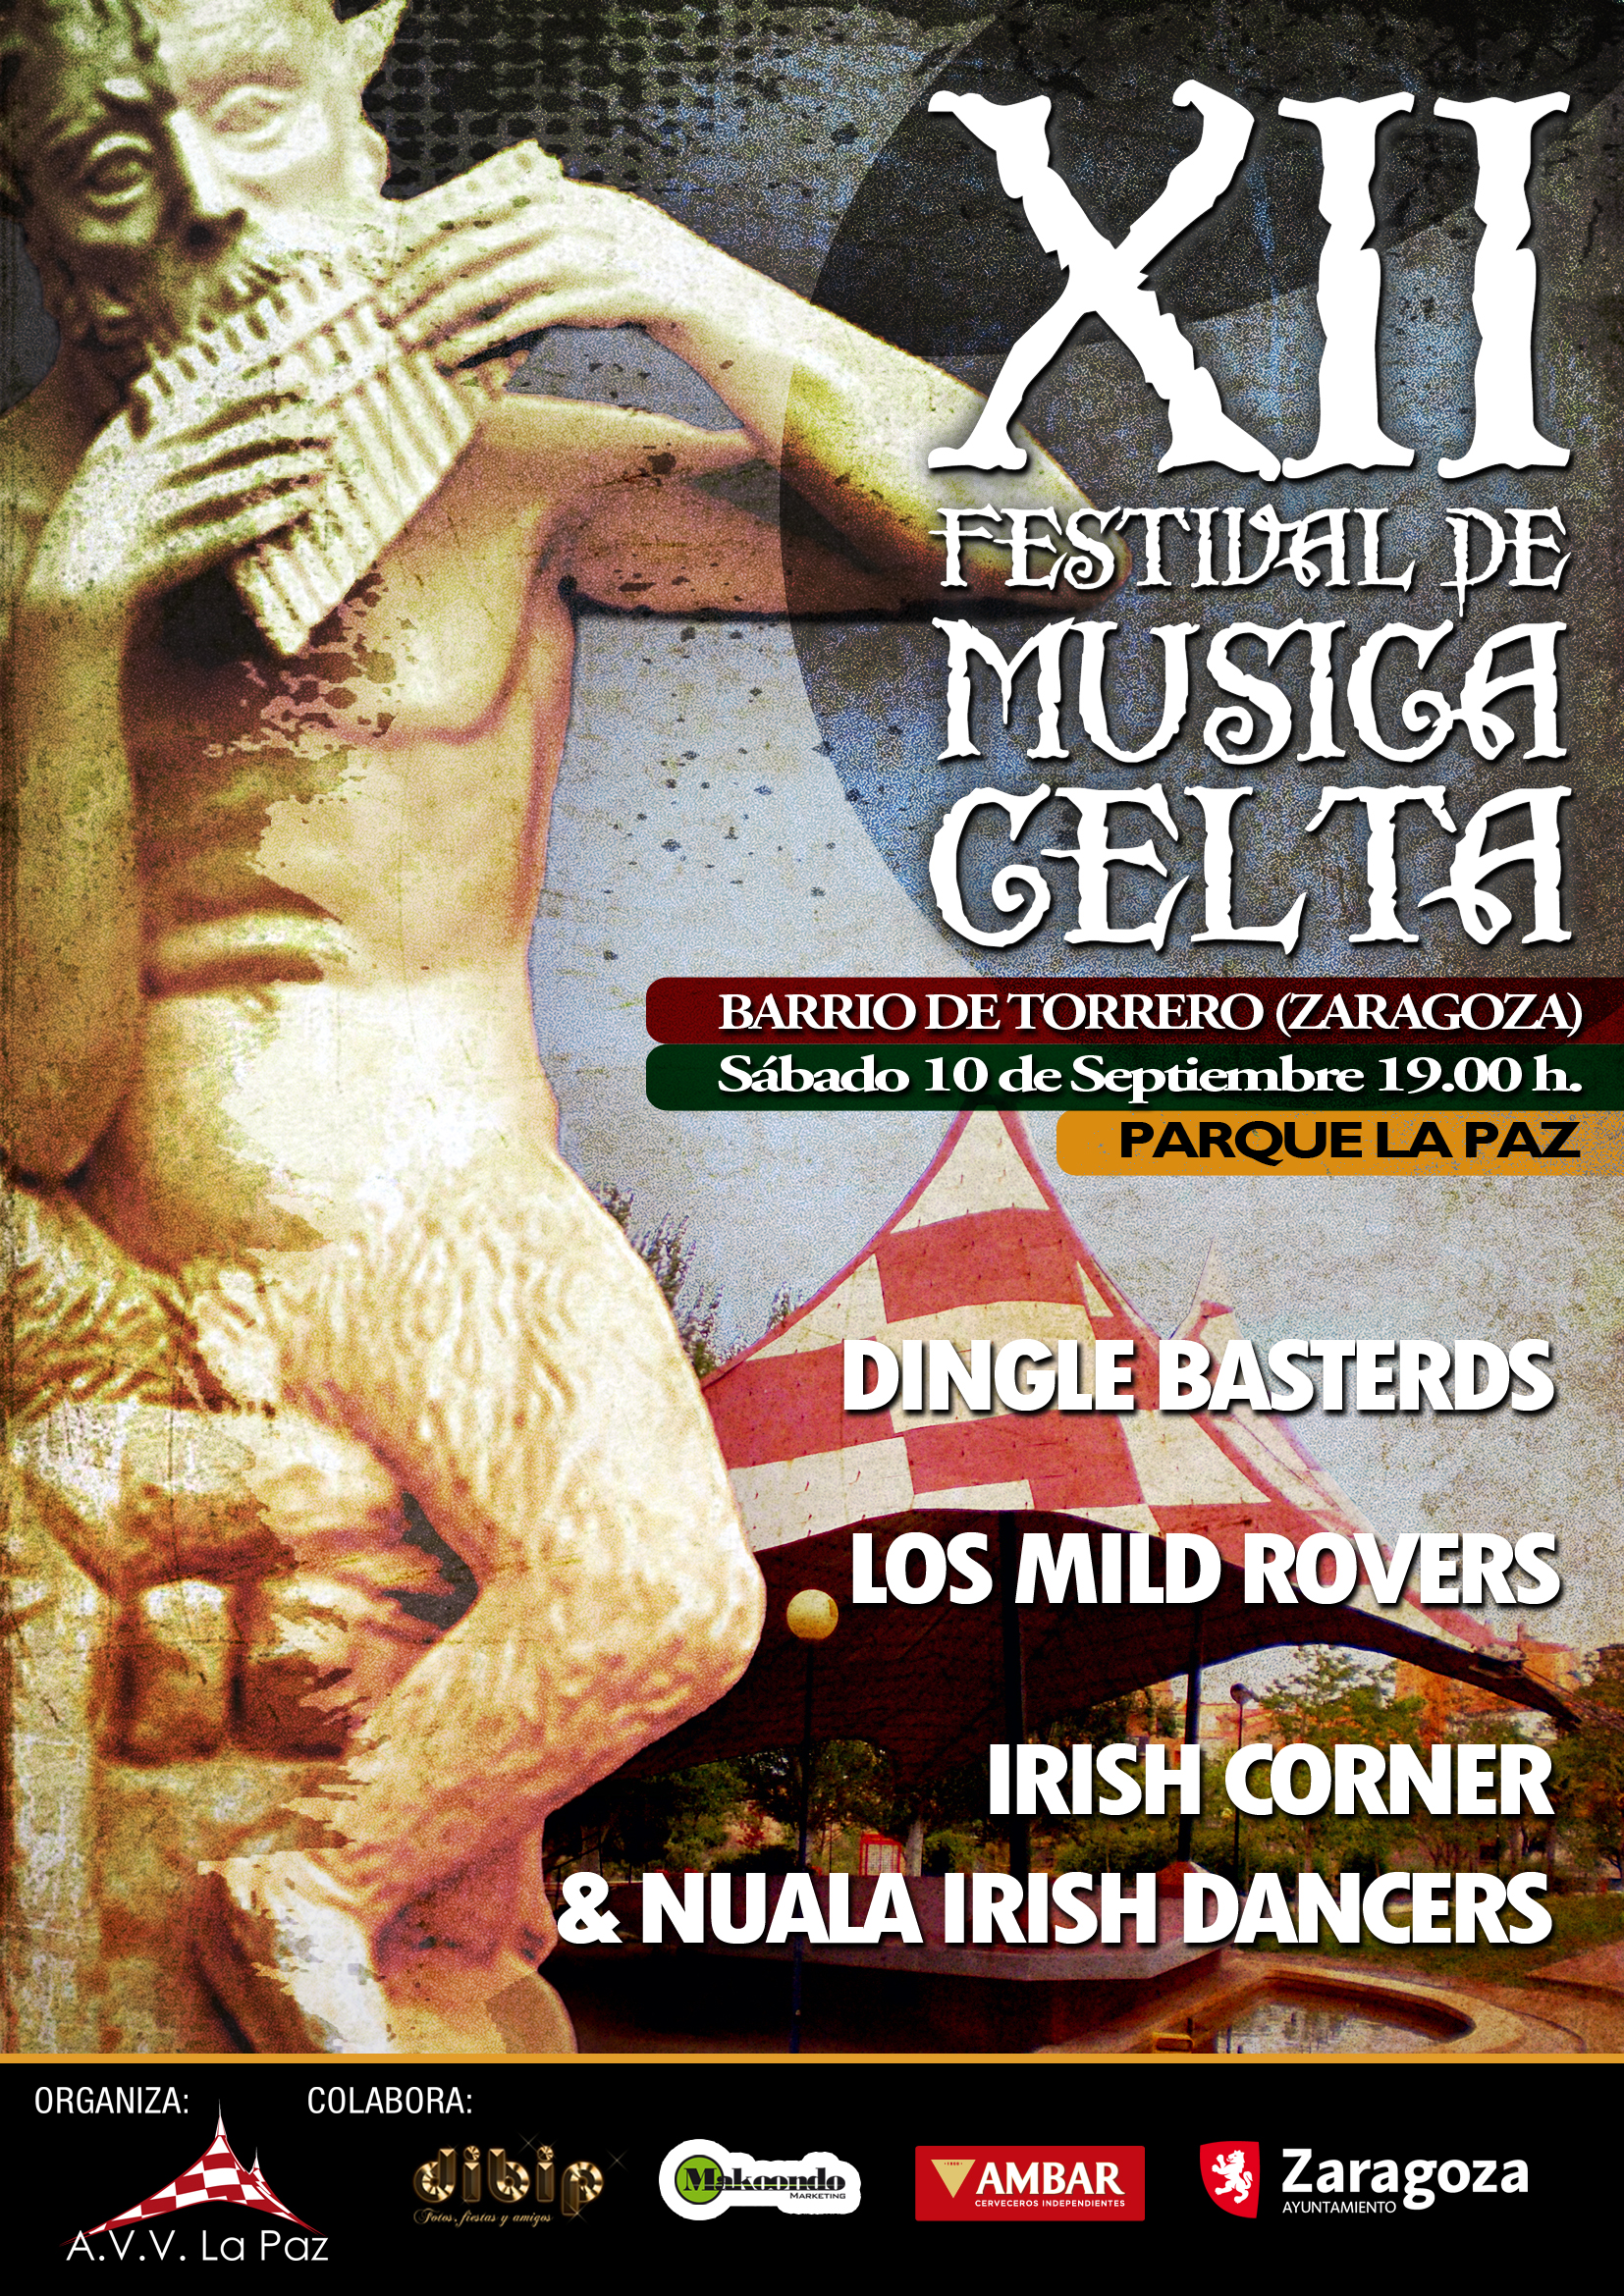 XII Festival de Música Celta Barrio de Torrero